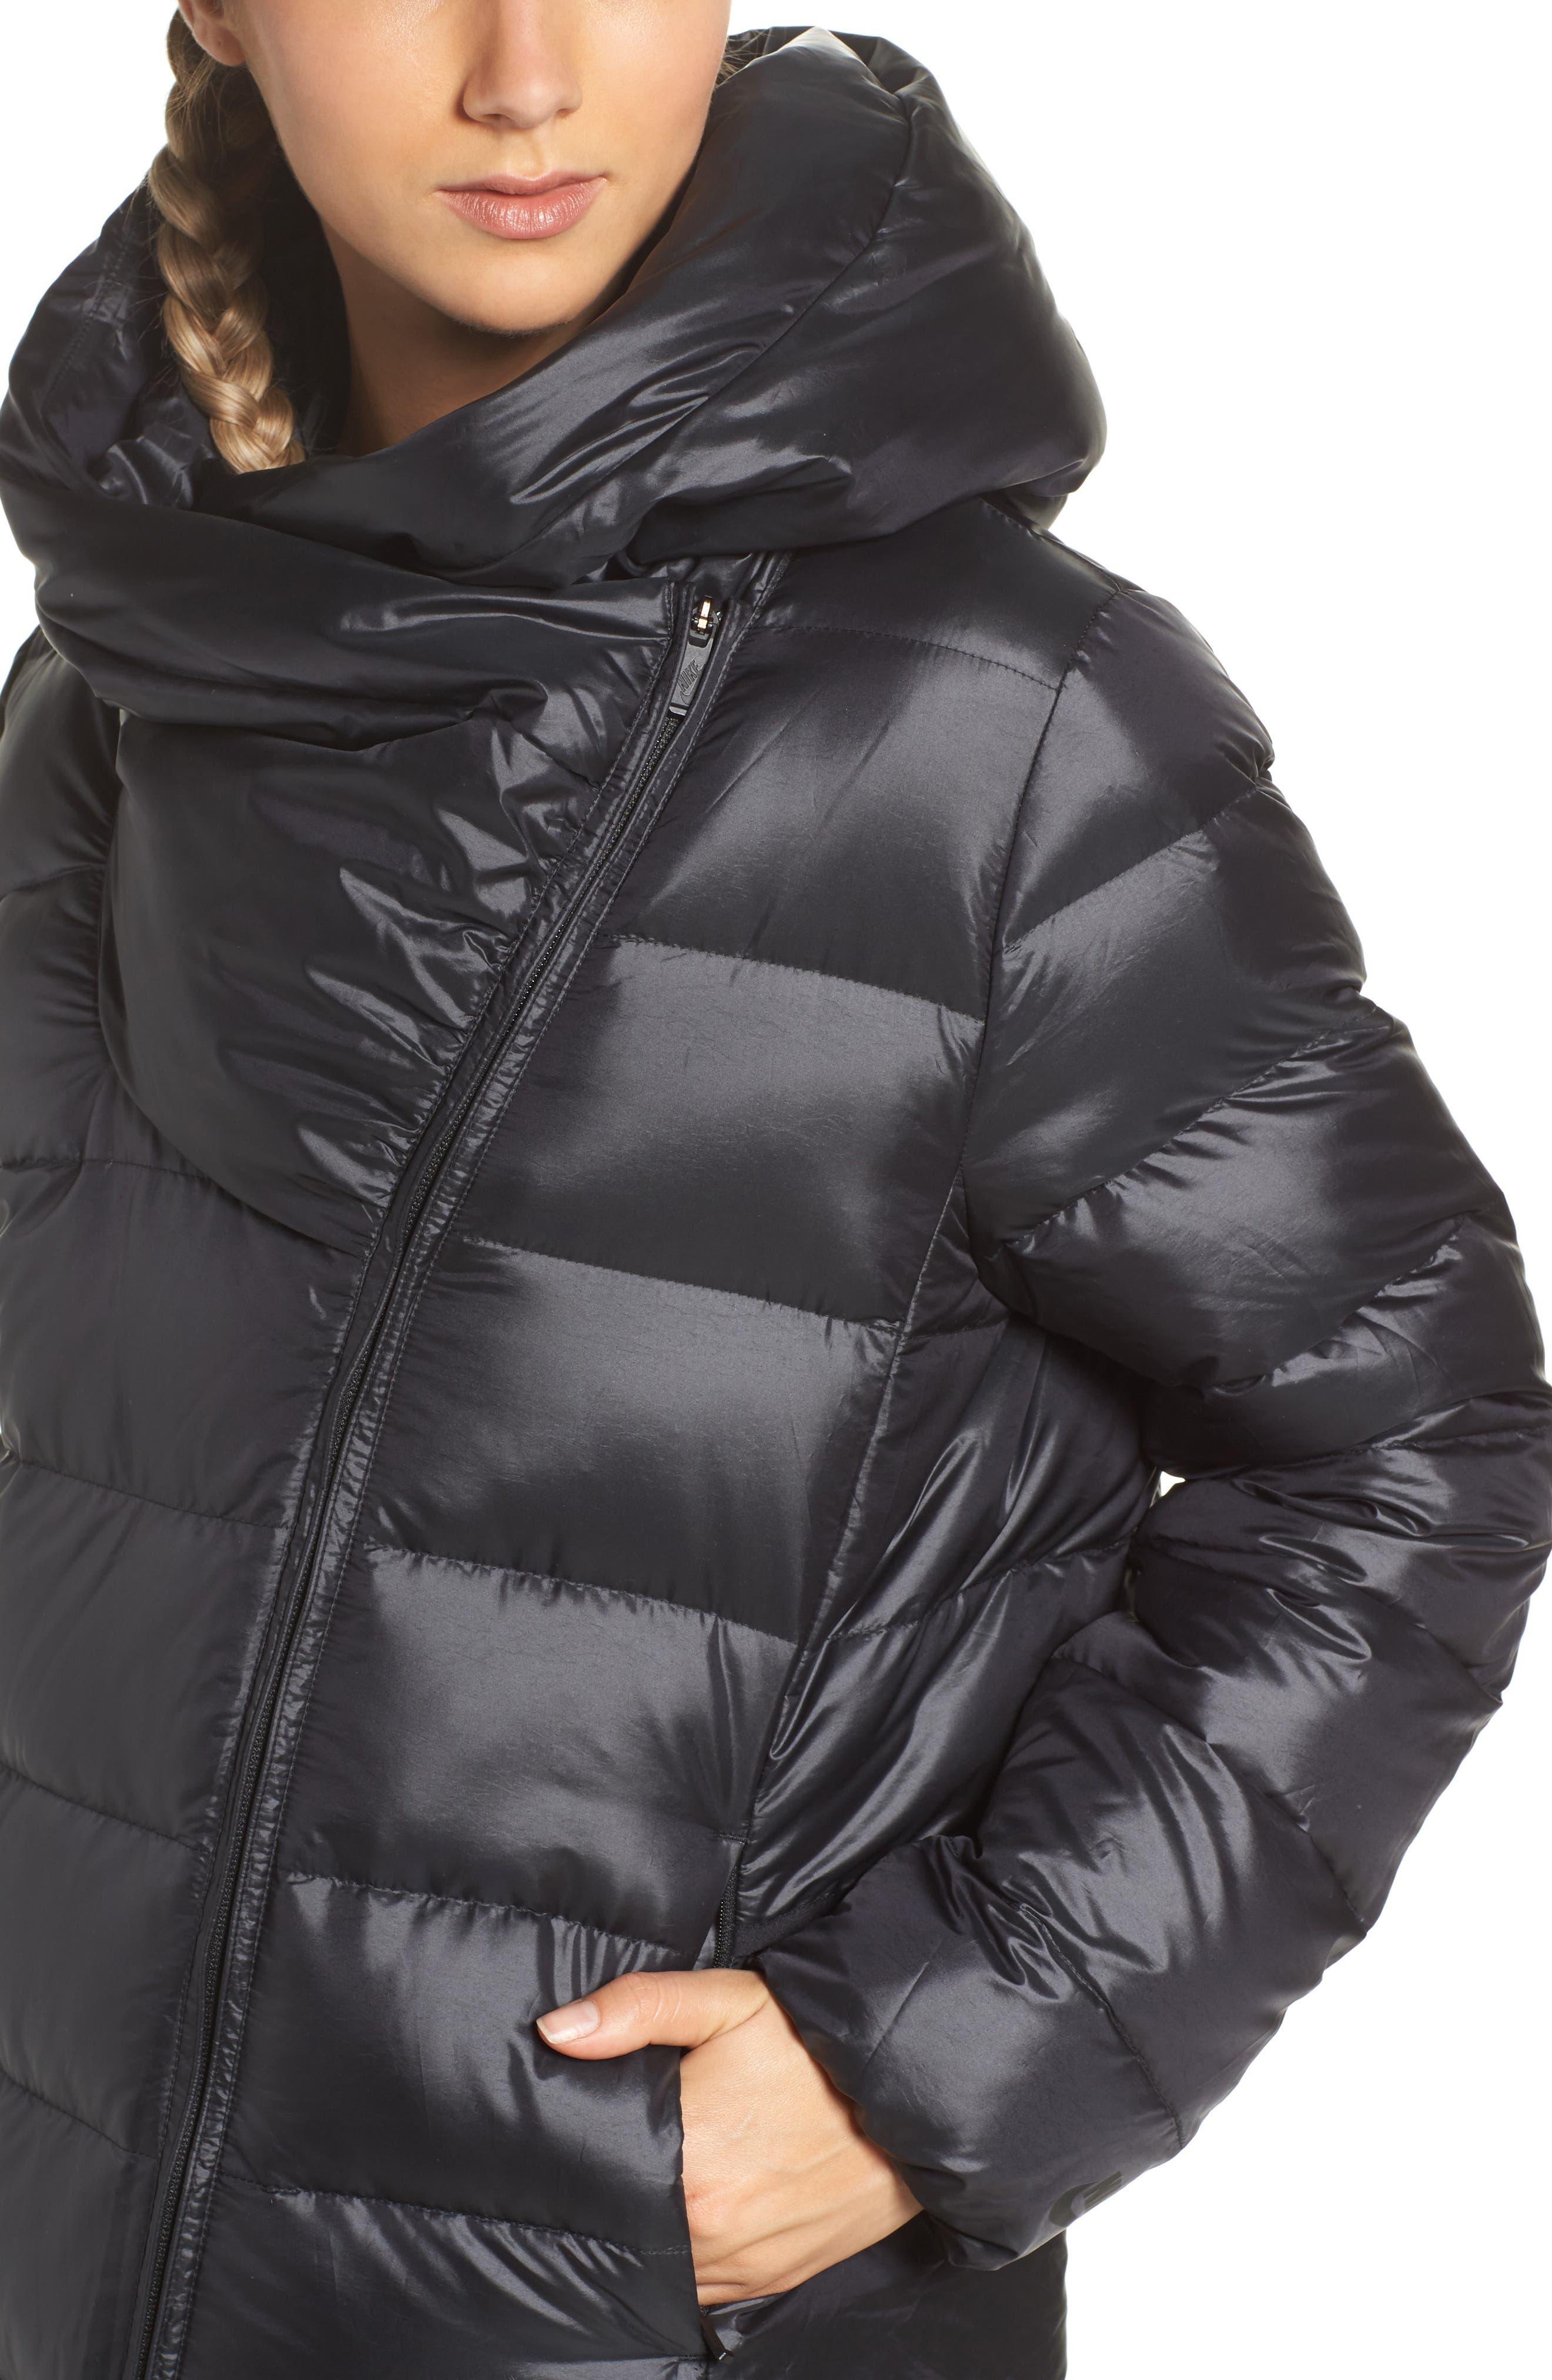 Sportswear Women's Down Parka,                             Alternate thumbnail 4, color,                             Black/ Black/ Black